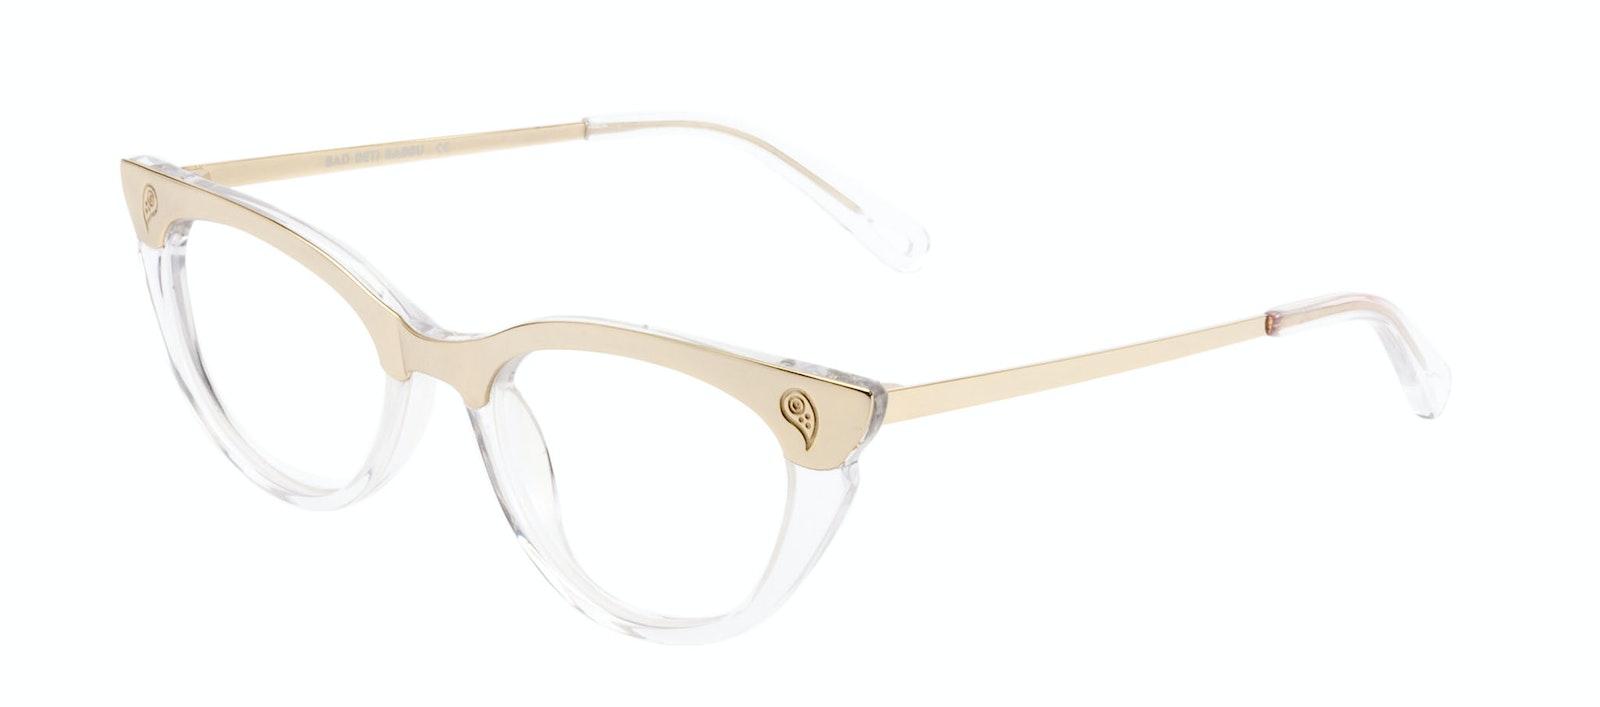 f334783f283 Affordable Fashion Glasses Cat Eye Daring Cateye Eyeglasses Women Bad Beti  Babbu Tilt